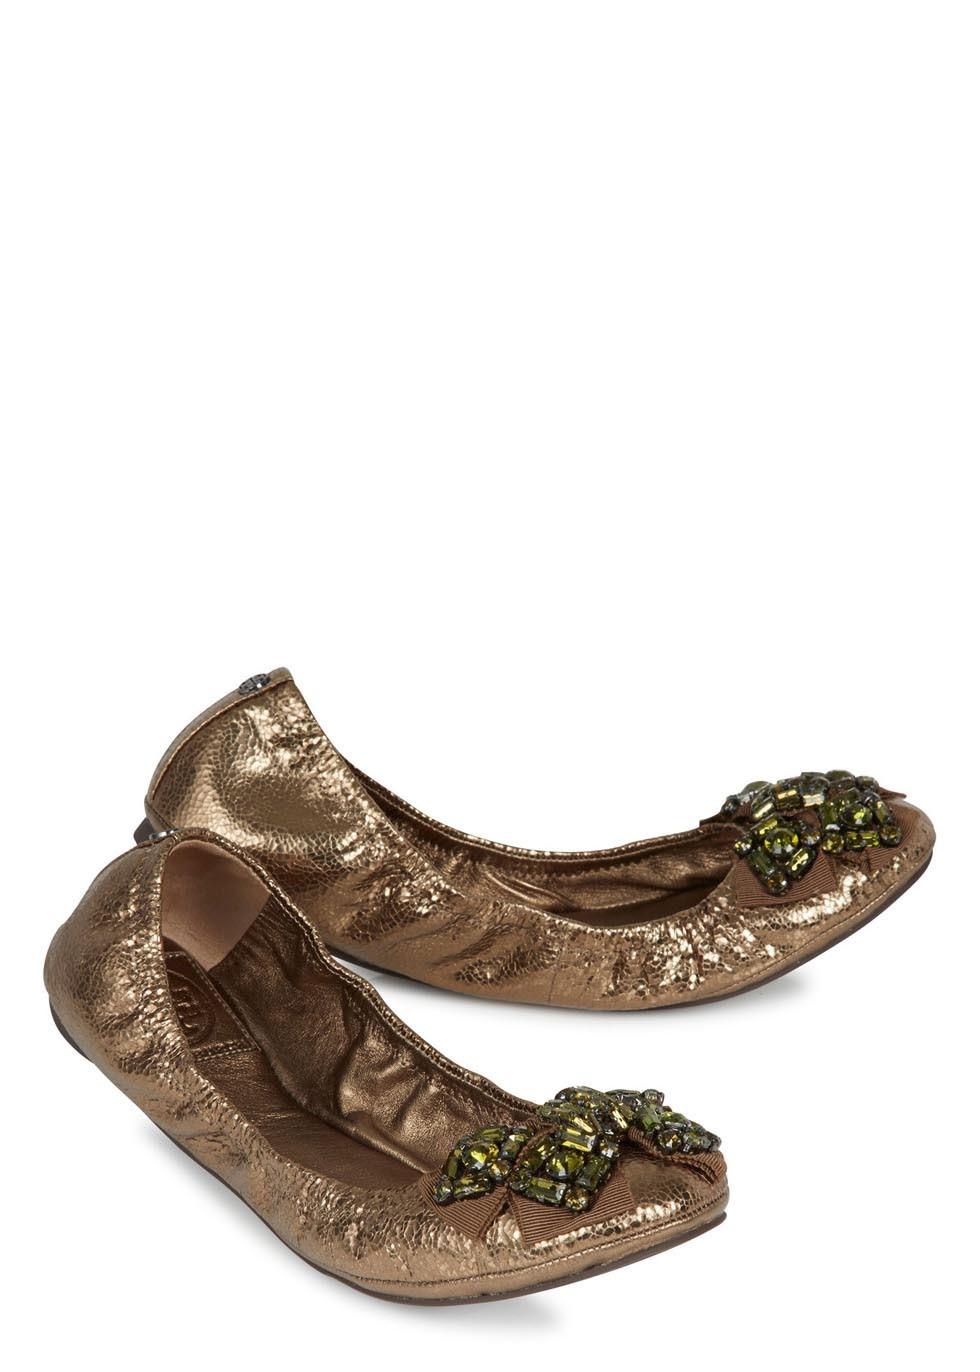 8e353c9abd7 Lyst - Tory Burch Azalea Bronze Cracked Leather Ballet Flats in Metallic